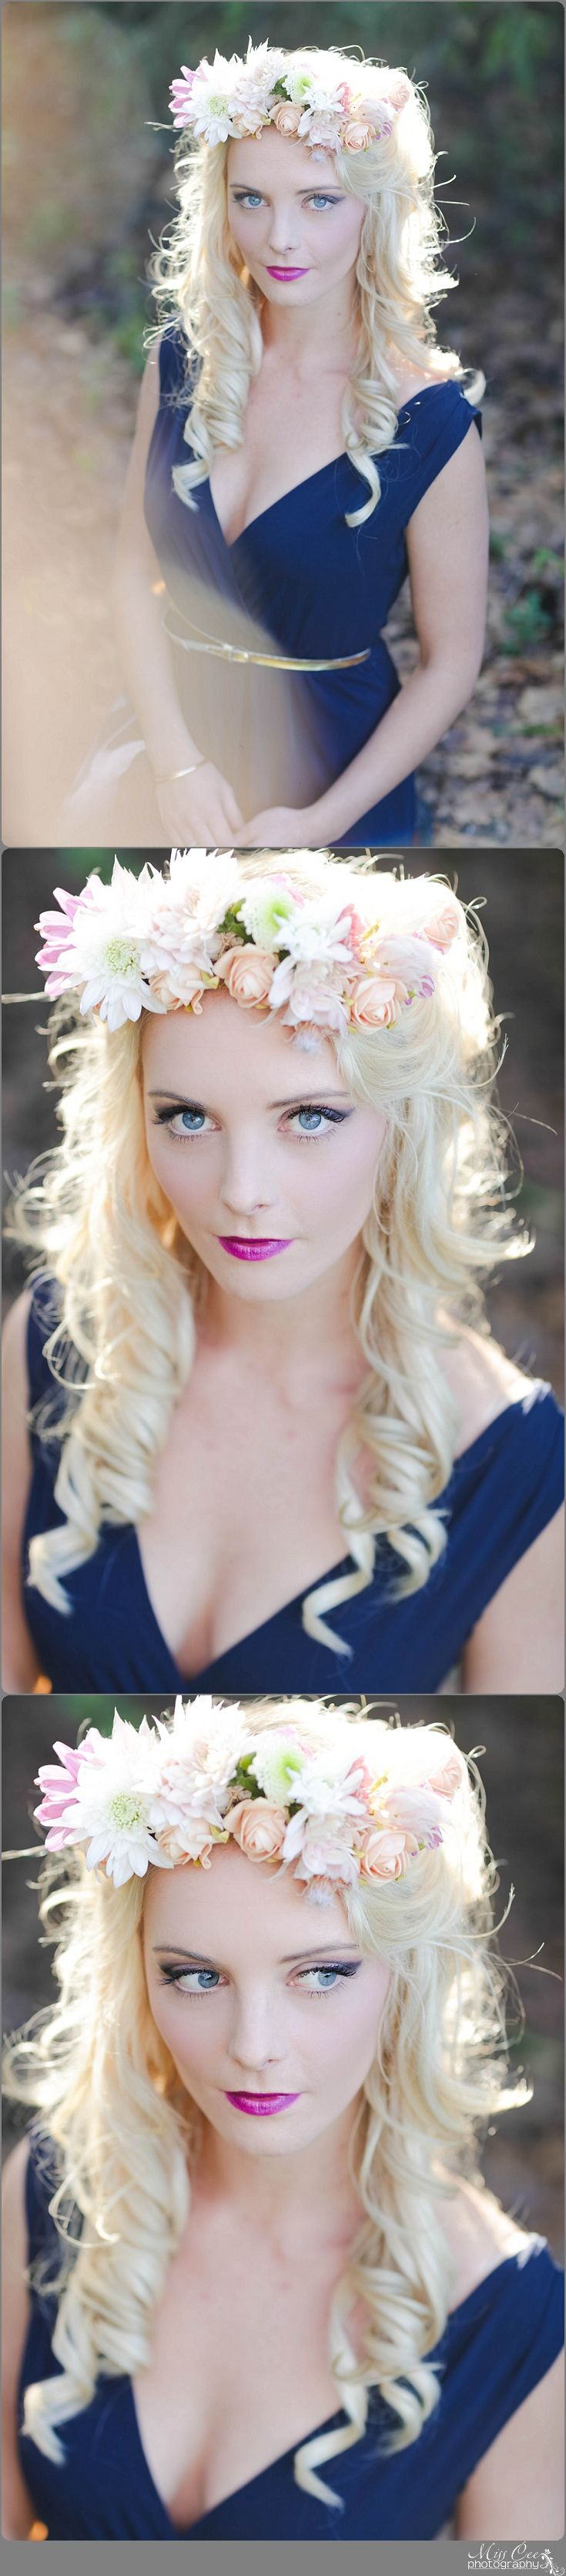 Dress, Long hair , Portrait , Girl Pose , Flowers , Make Up , Forest , Beauty Shoot , Floral Crown , Plum Lips